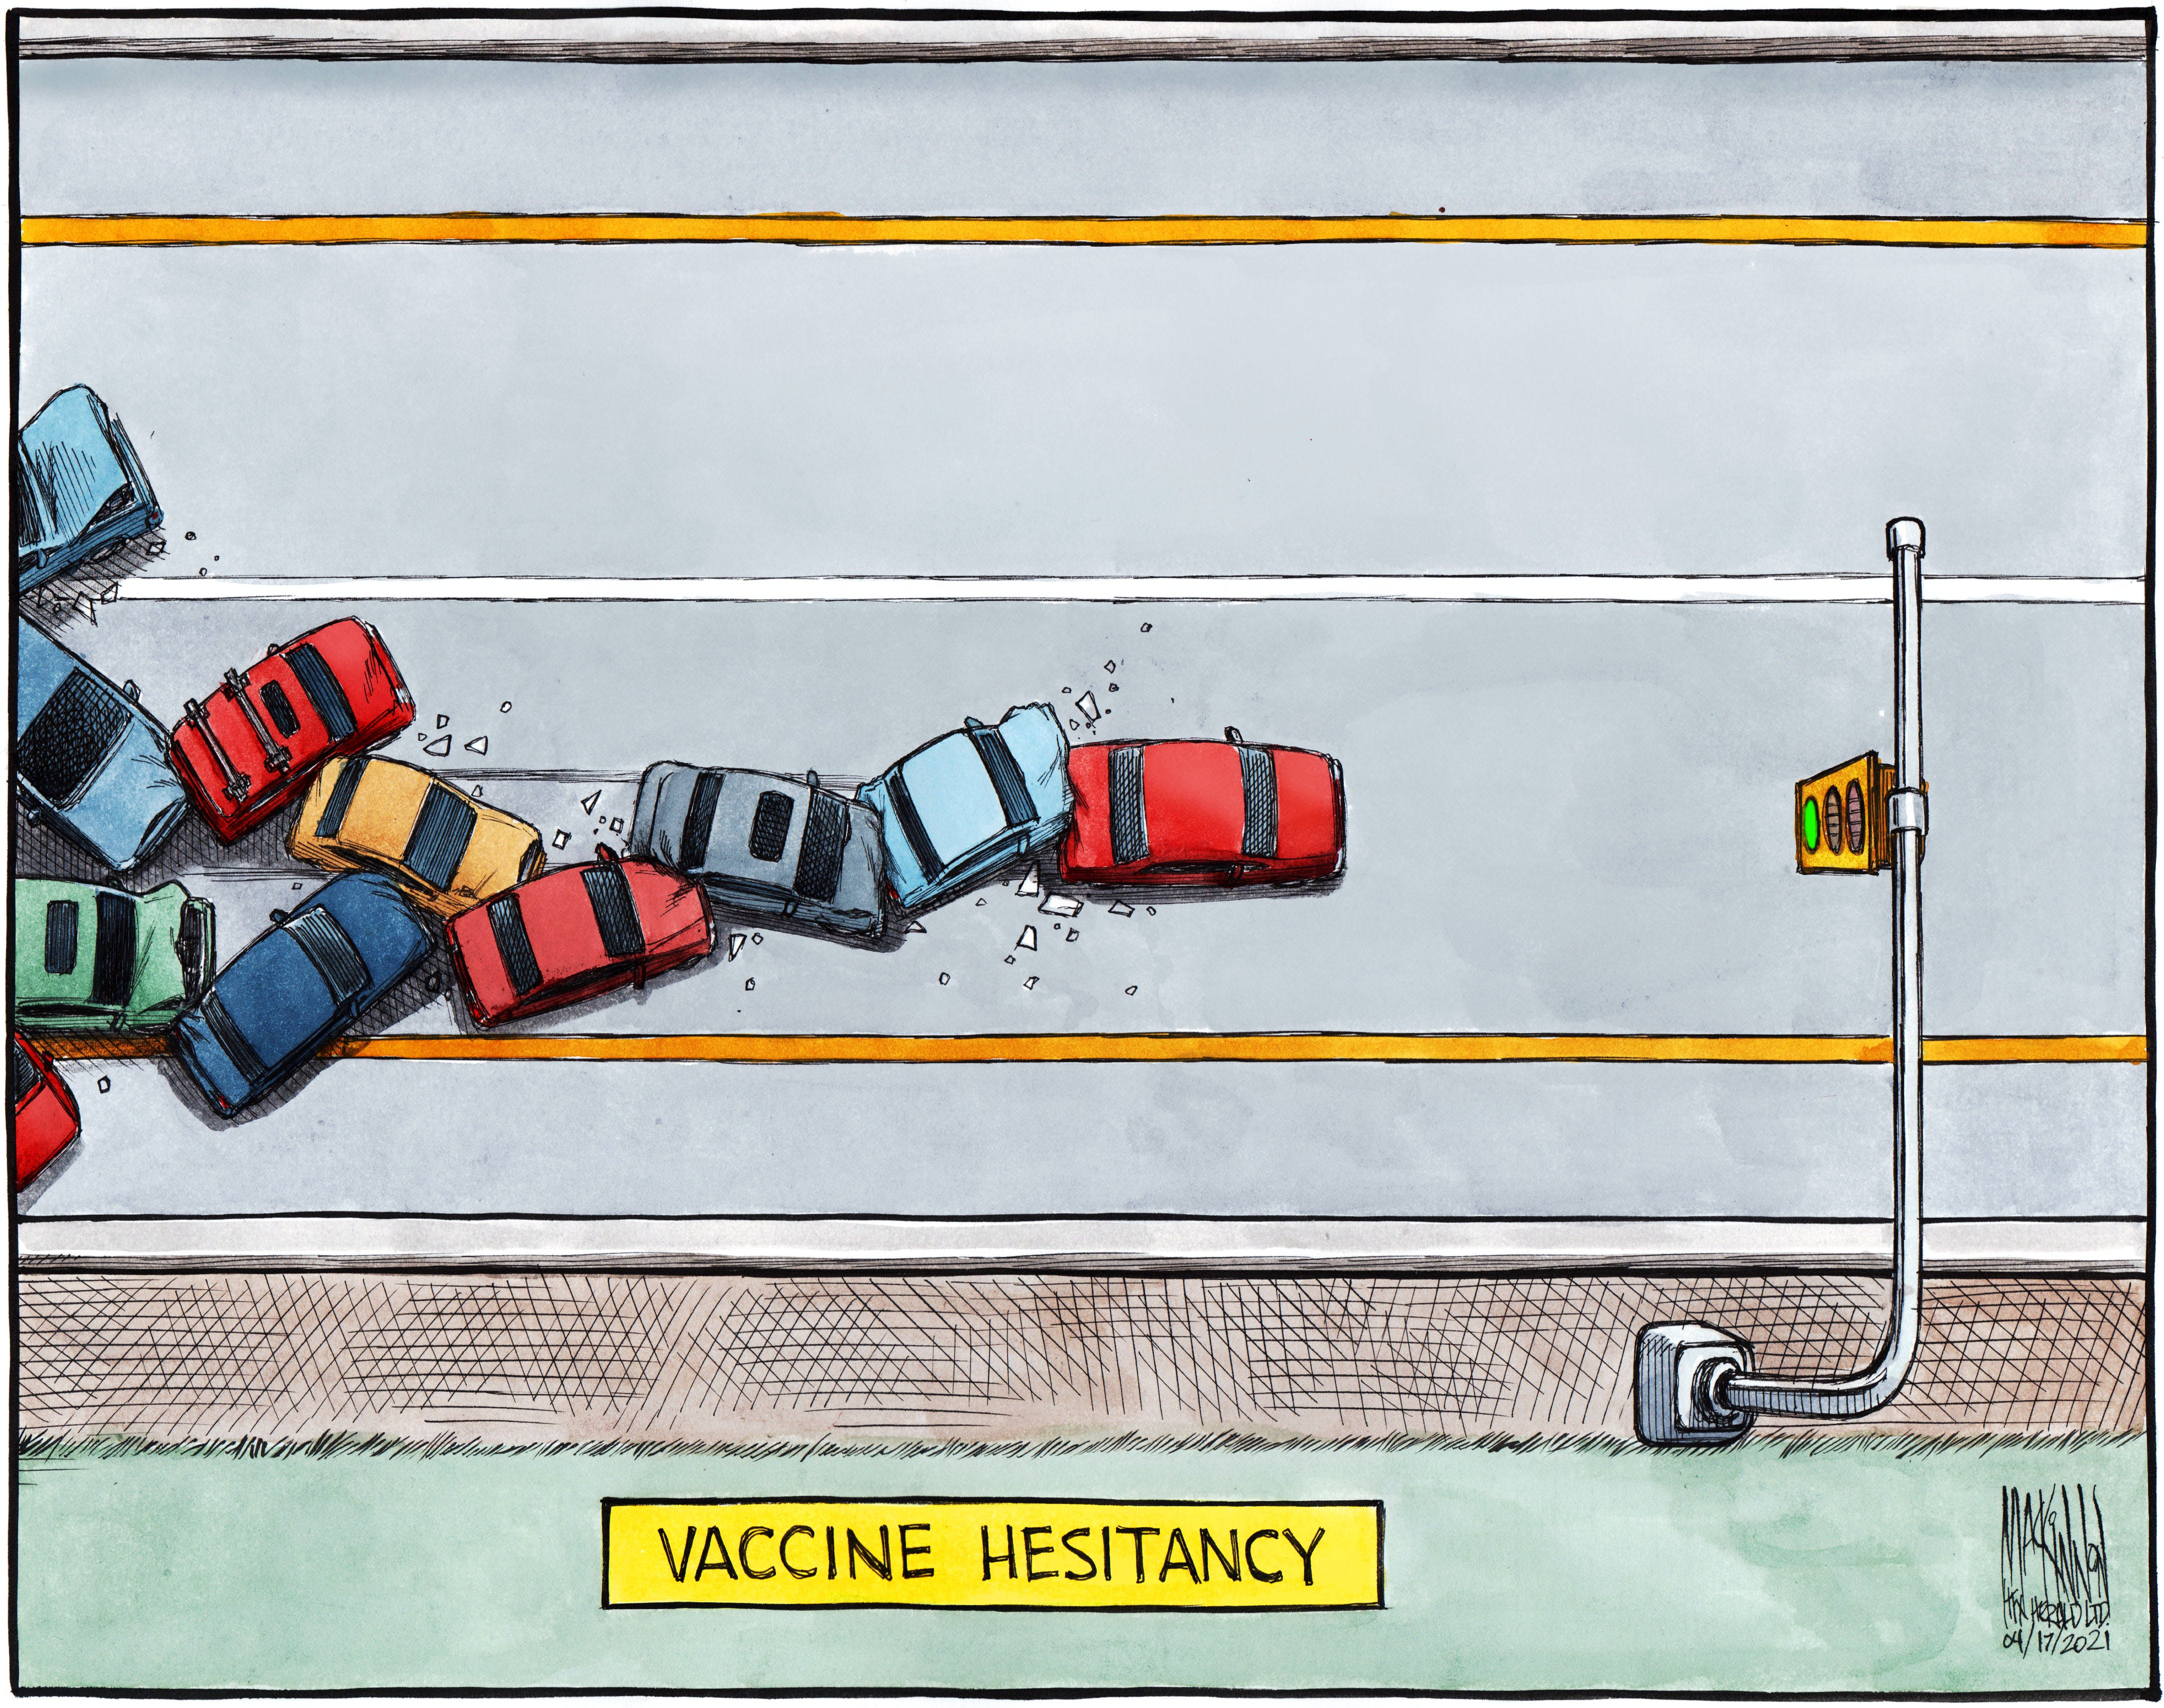 Bruce MacKinnon's cartoon April 17, 2021.